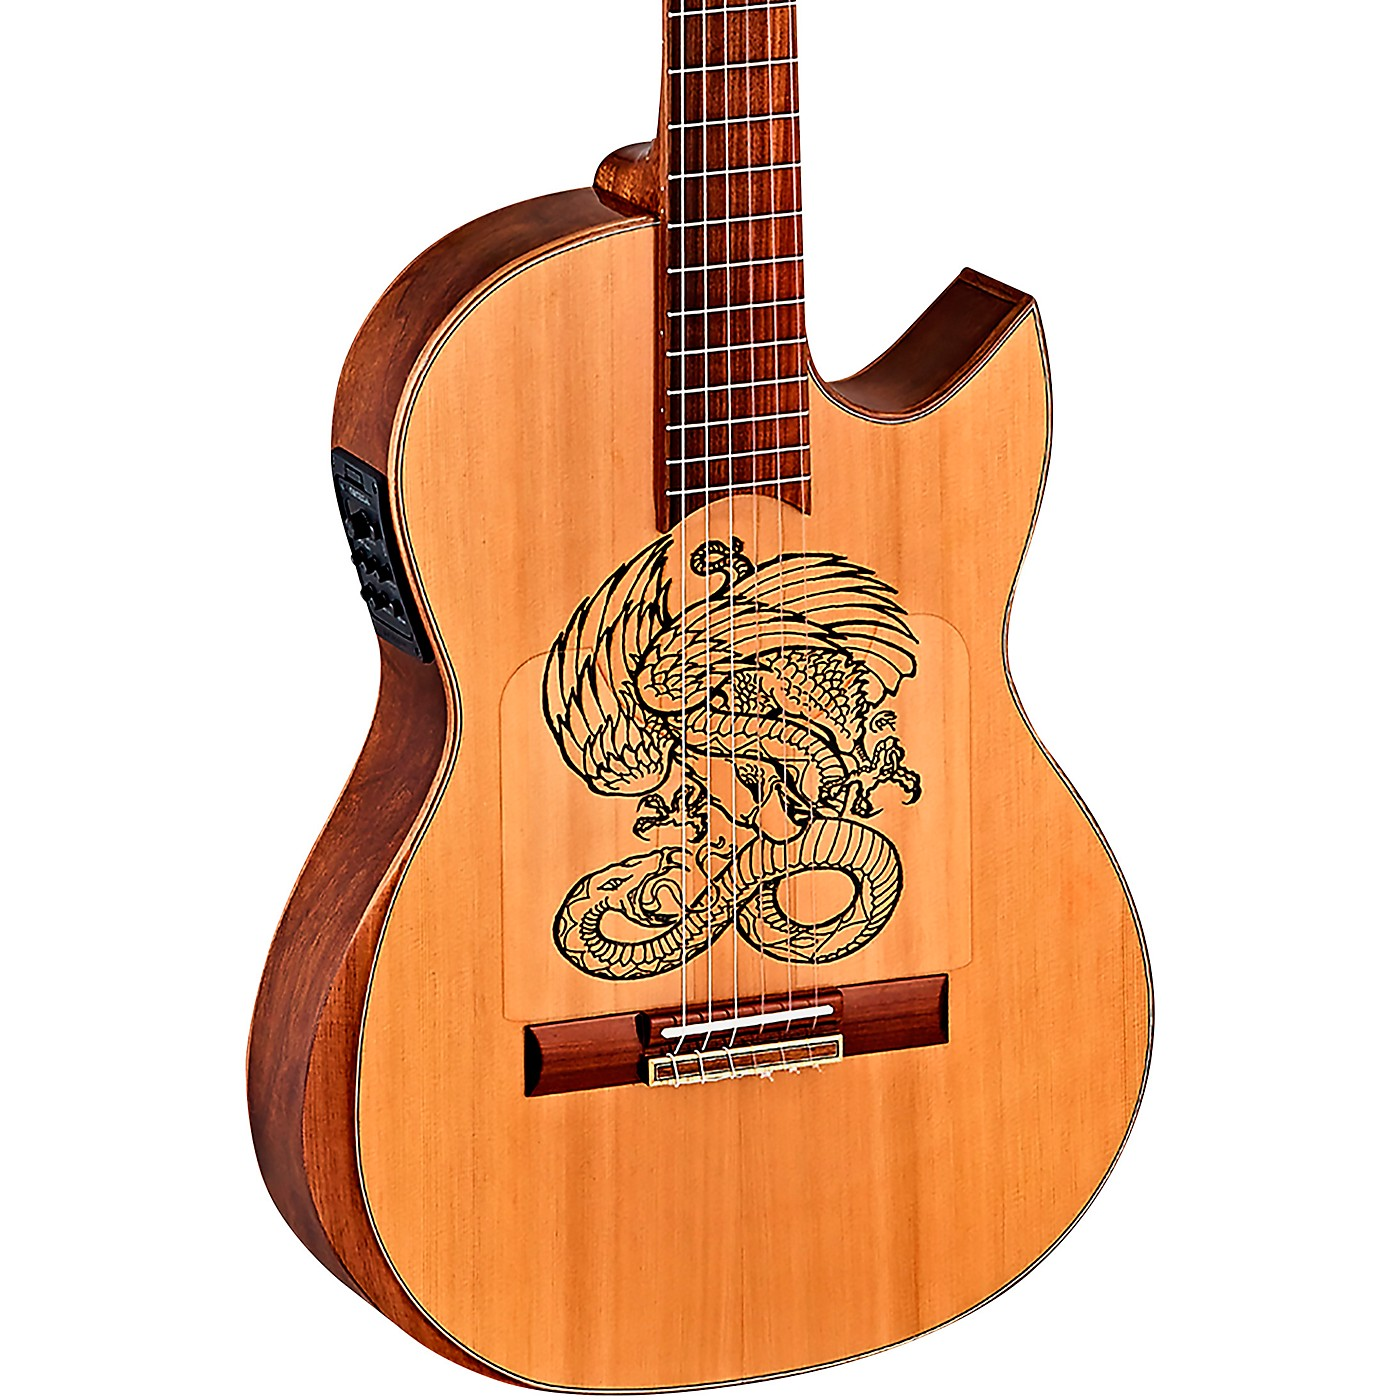 Ortega Ben Woods Flametal-One Signature Flamenco Acoustic-Electric Guitar thumbnail